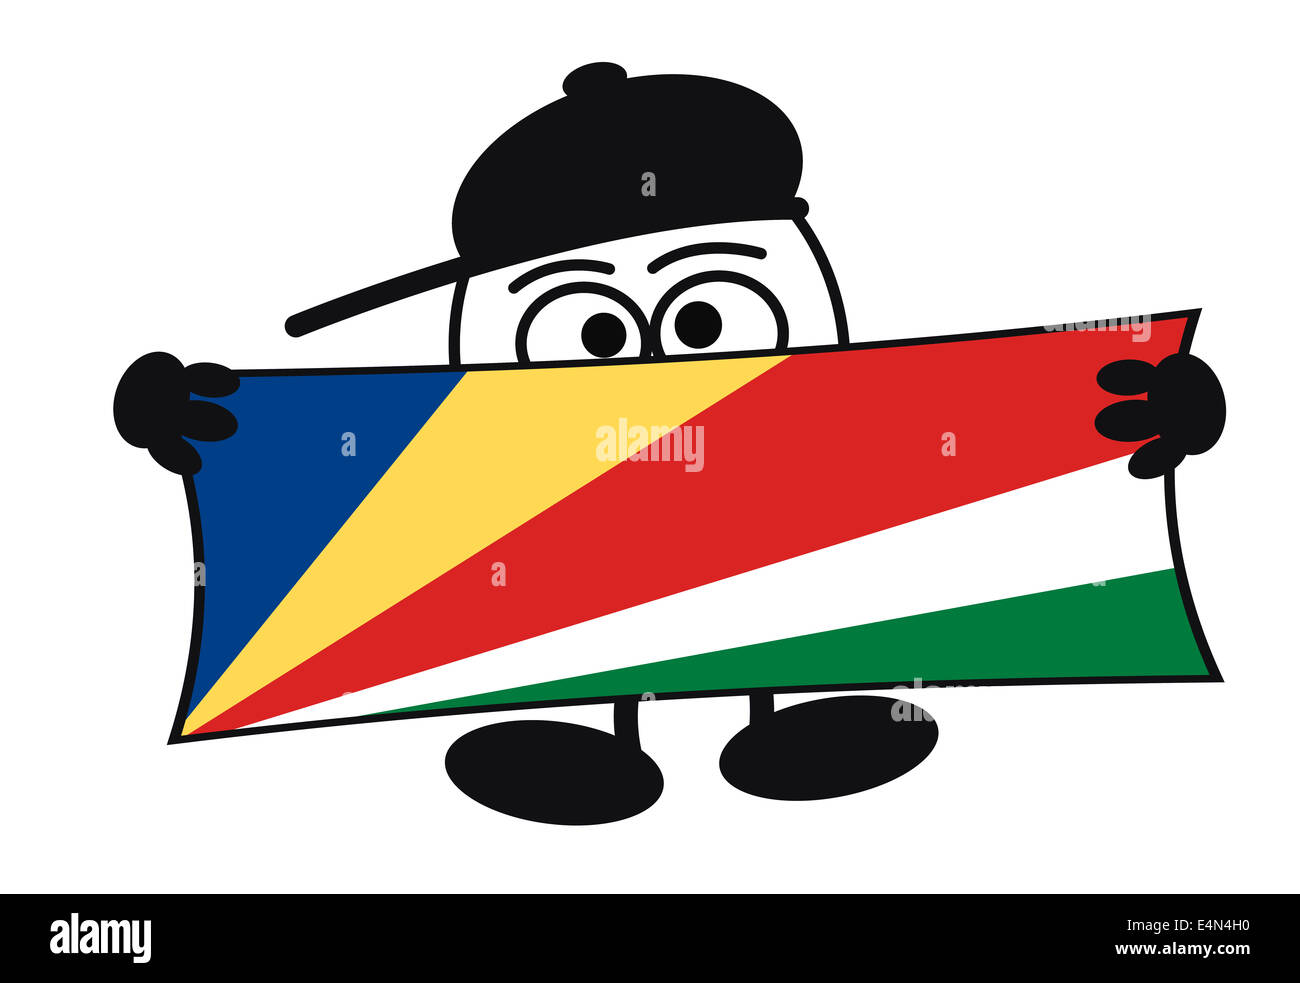 Eierkopf - Welcome Seychelles Stock Photo